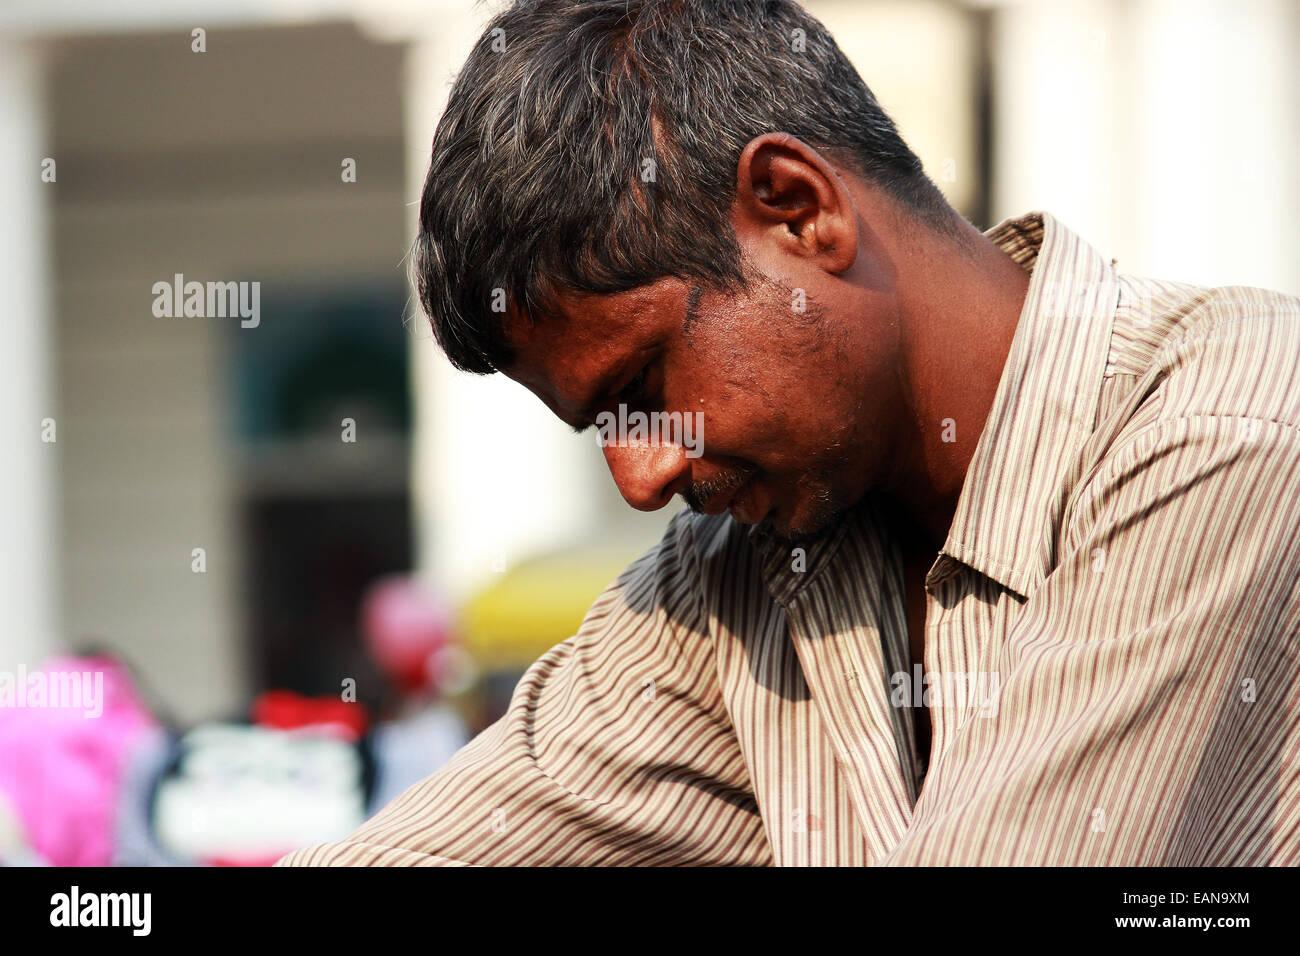 man, male, clothe, black, indian, new Delhi, India. - Stock Image